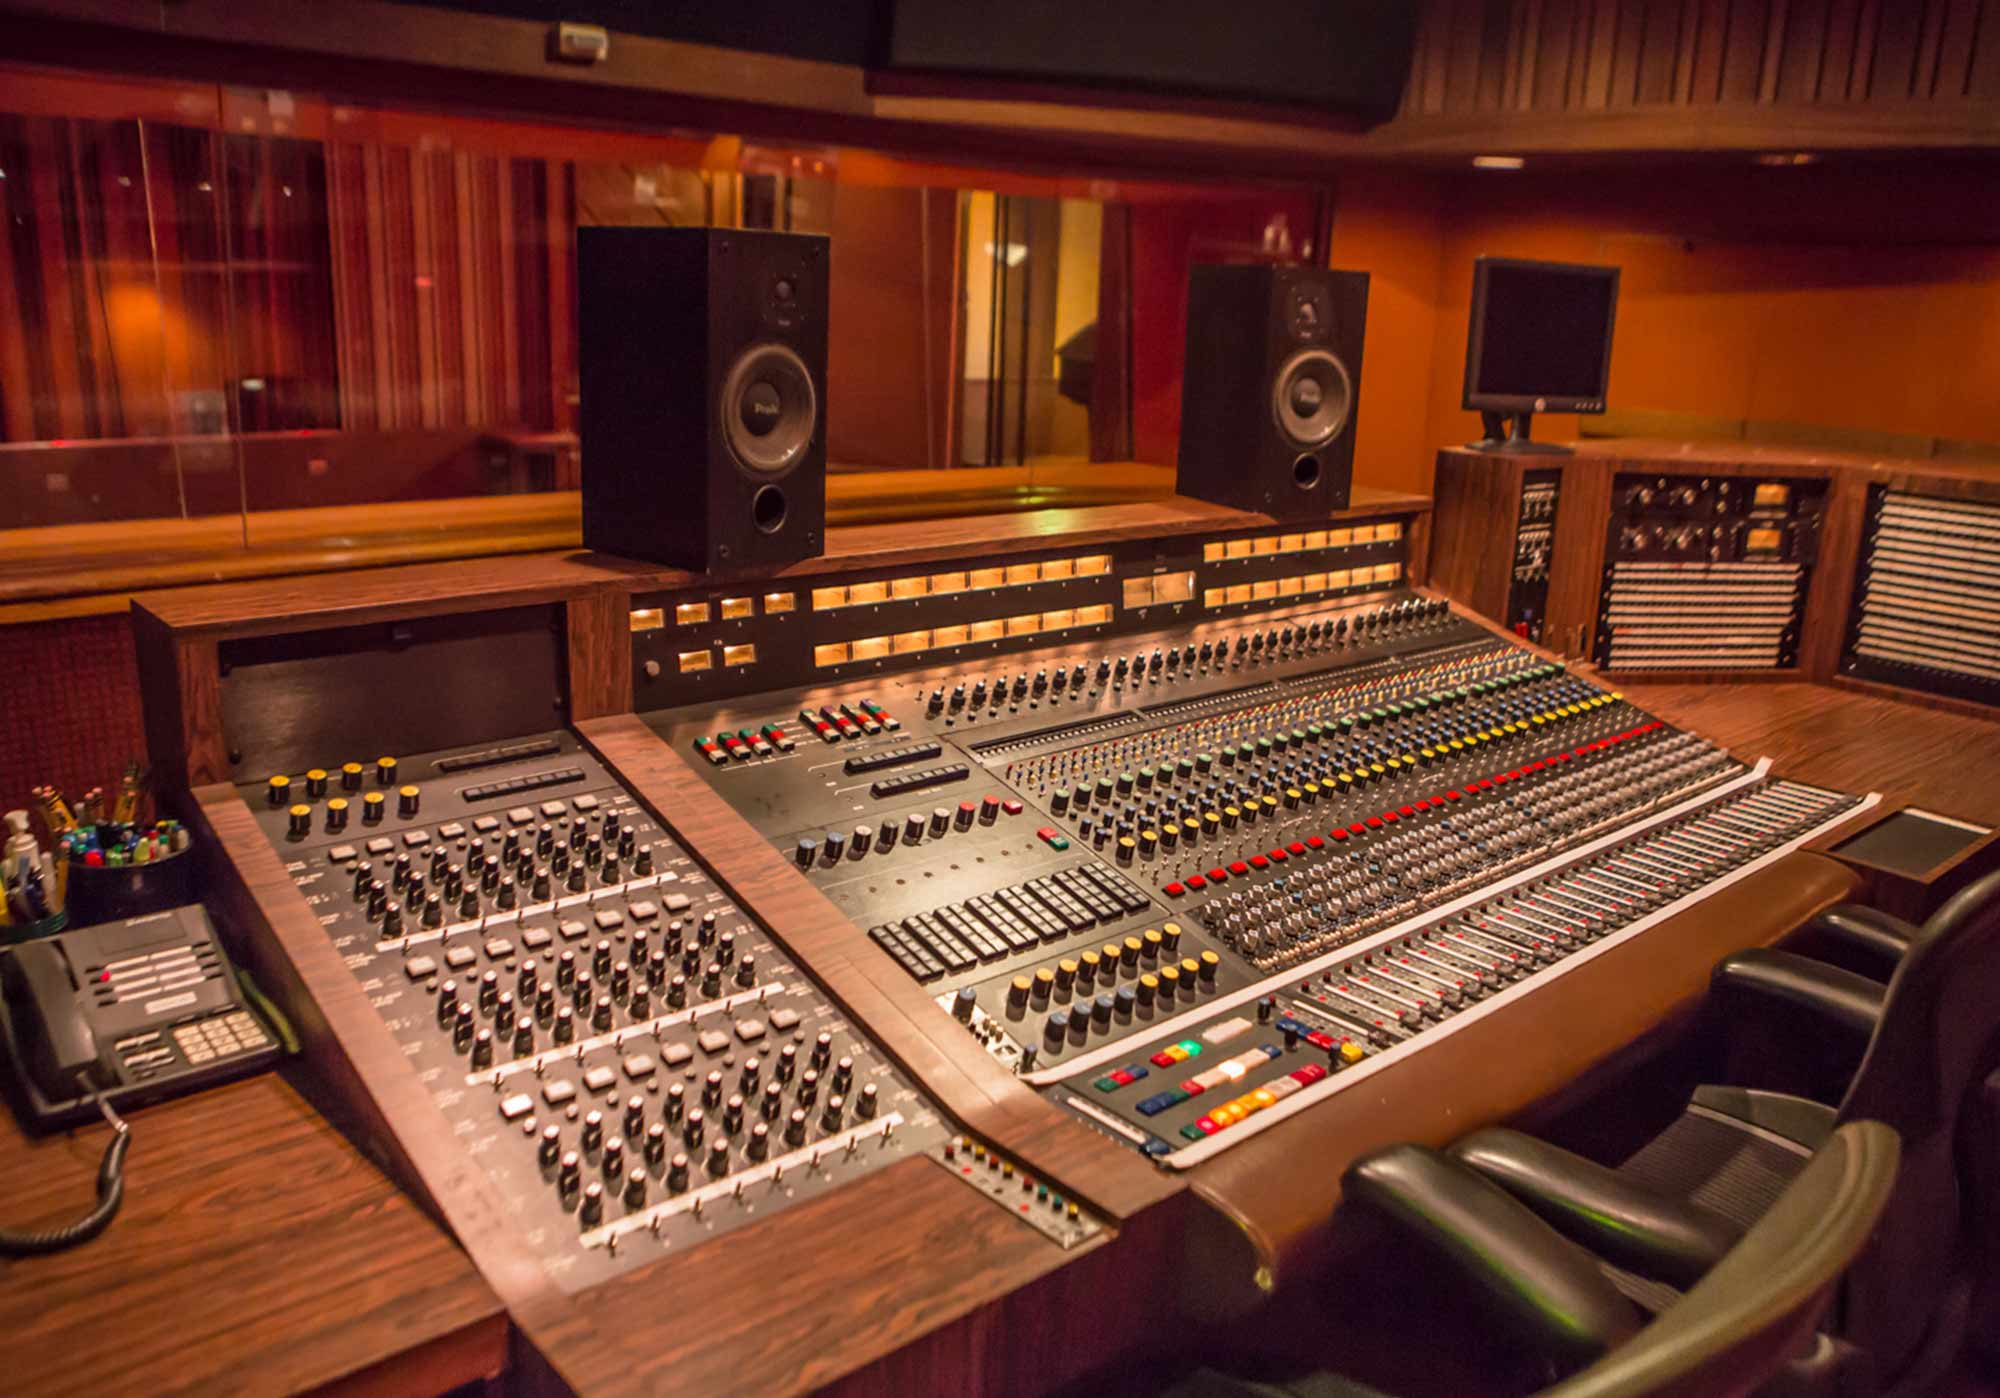 sunset_studios_control_room_3